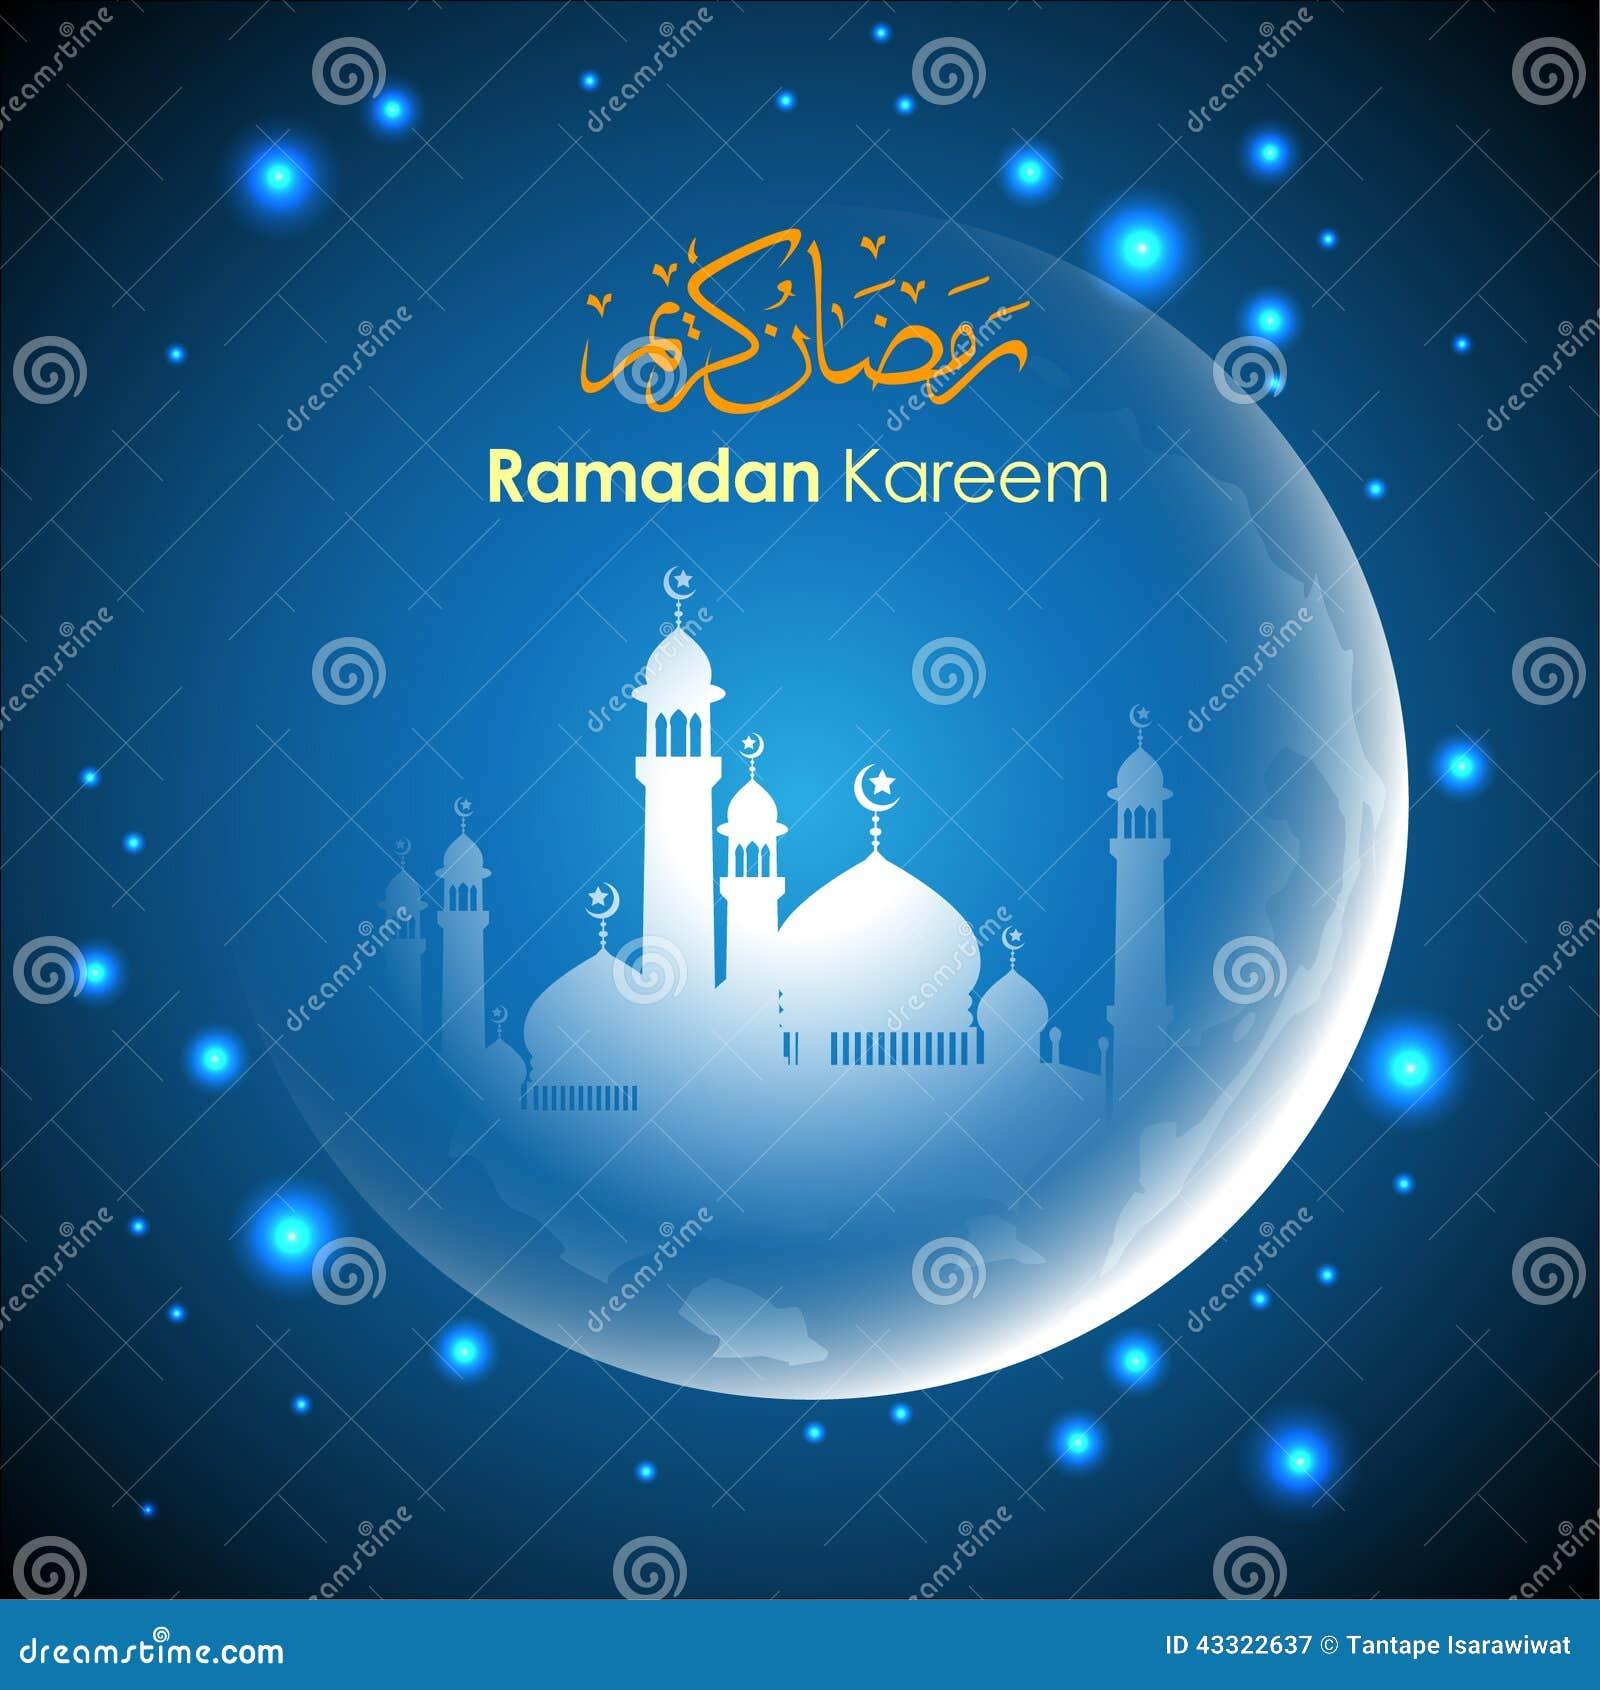 Ramadan greetings in arabic script stock vector illustration of ramadan greetings in arabic script mubarak lamp kristyandbryce Images